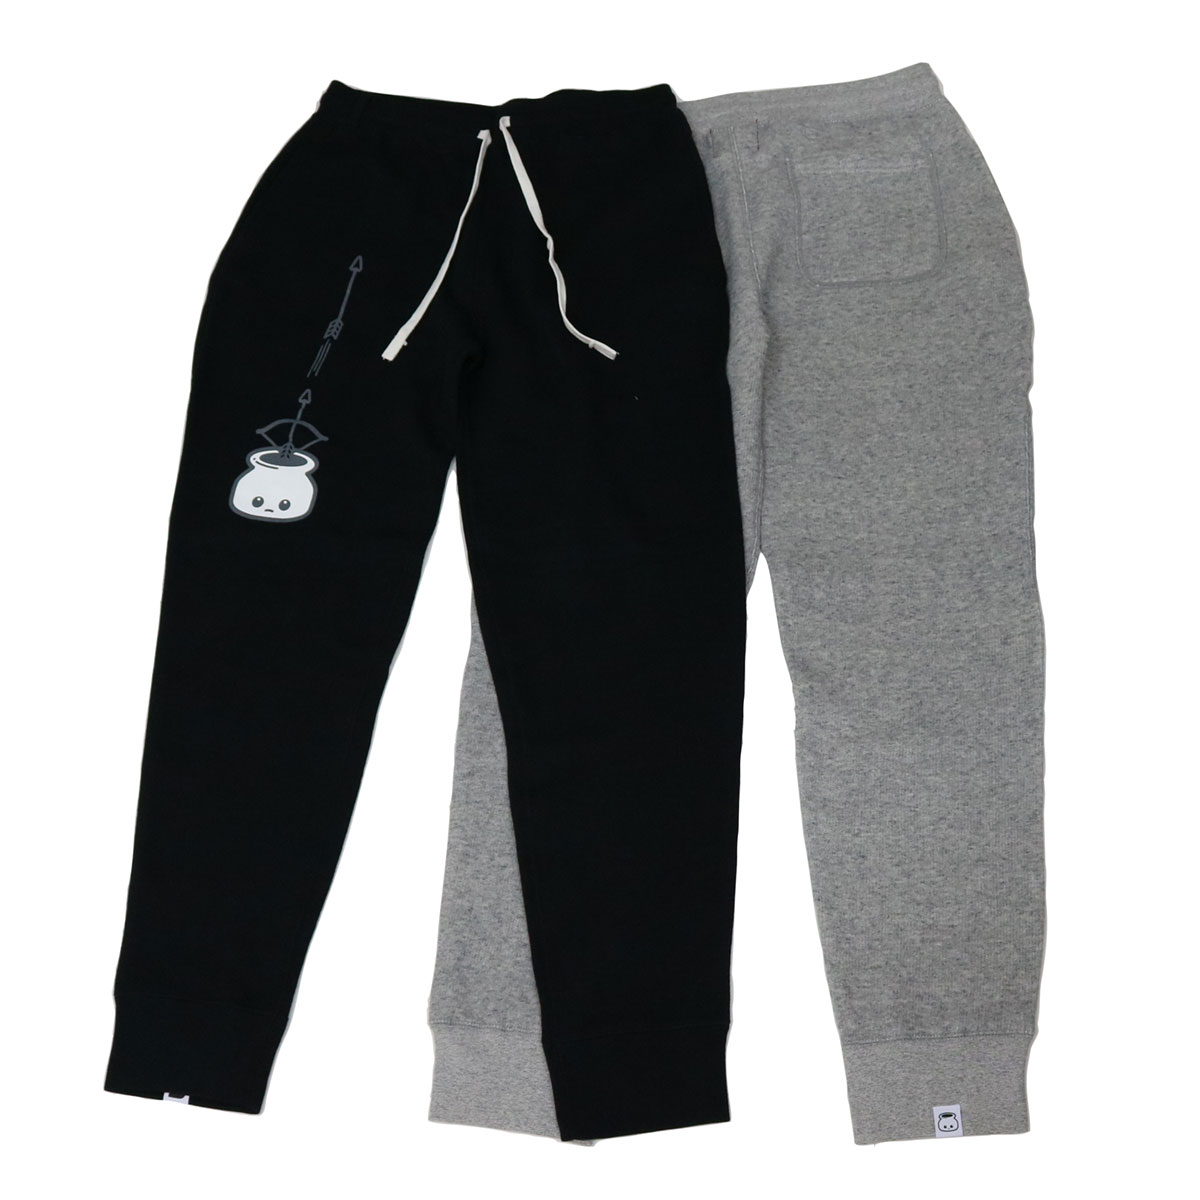 Target Sweatpants (Black)